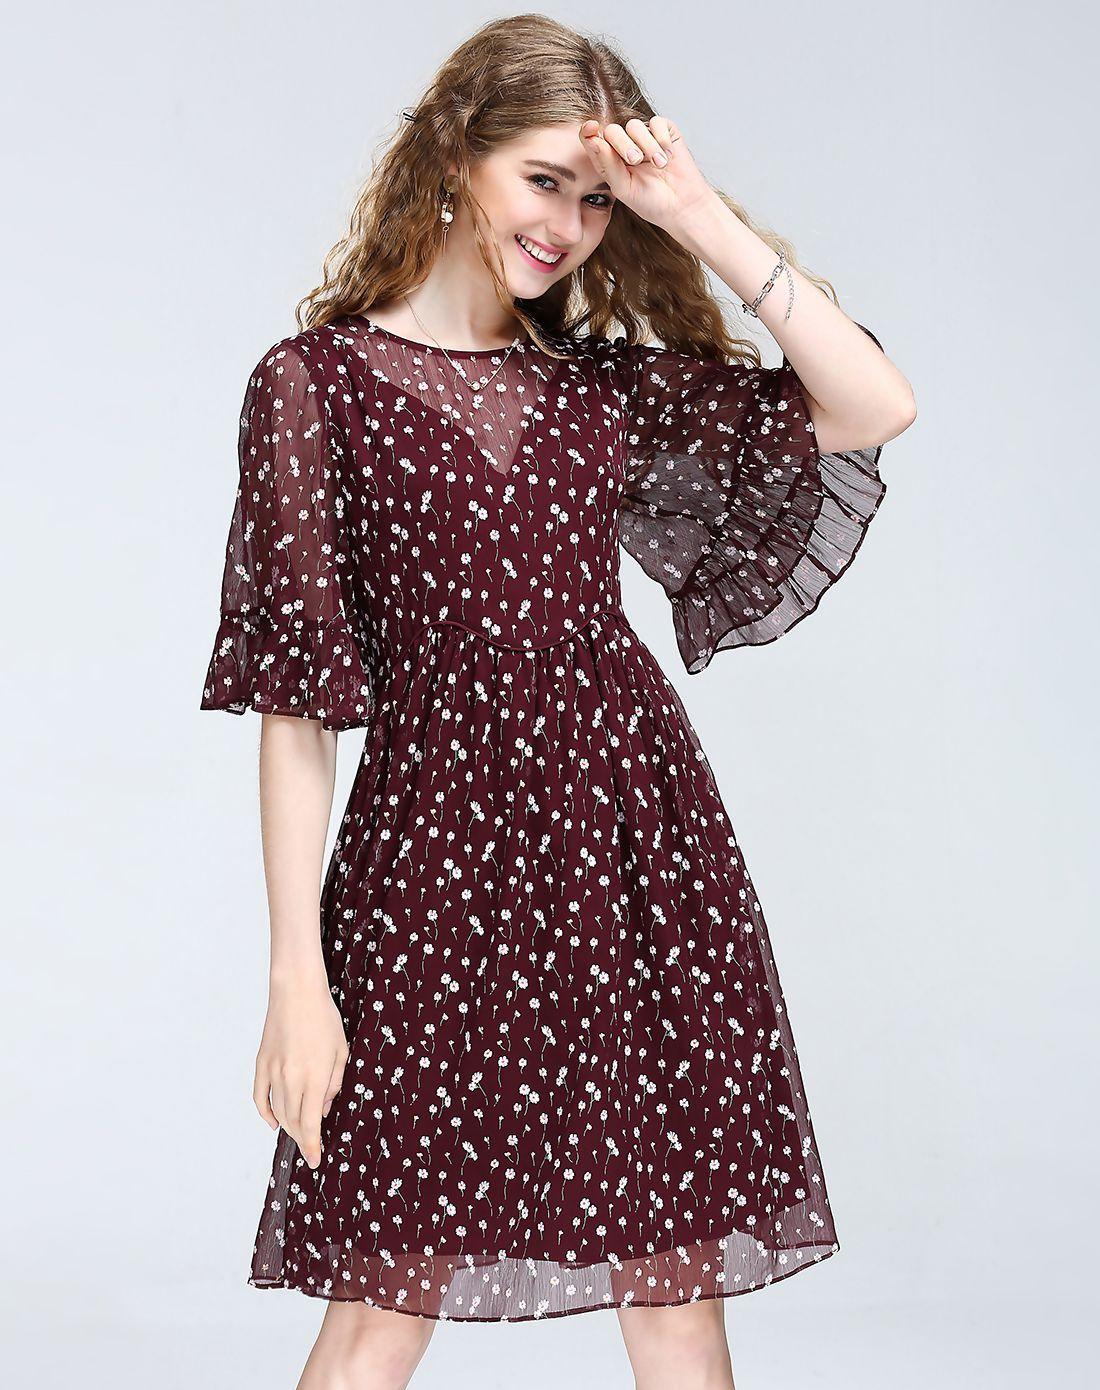 Adorewe vipme aline dressesdesigner kk wine chiffon floral